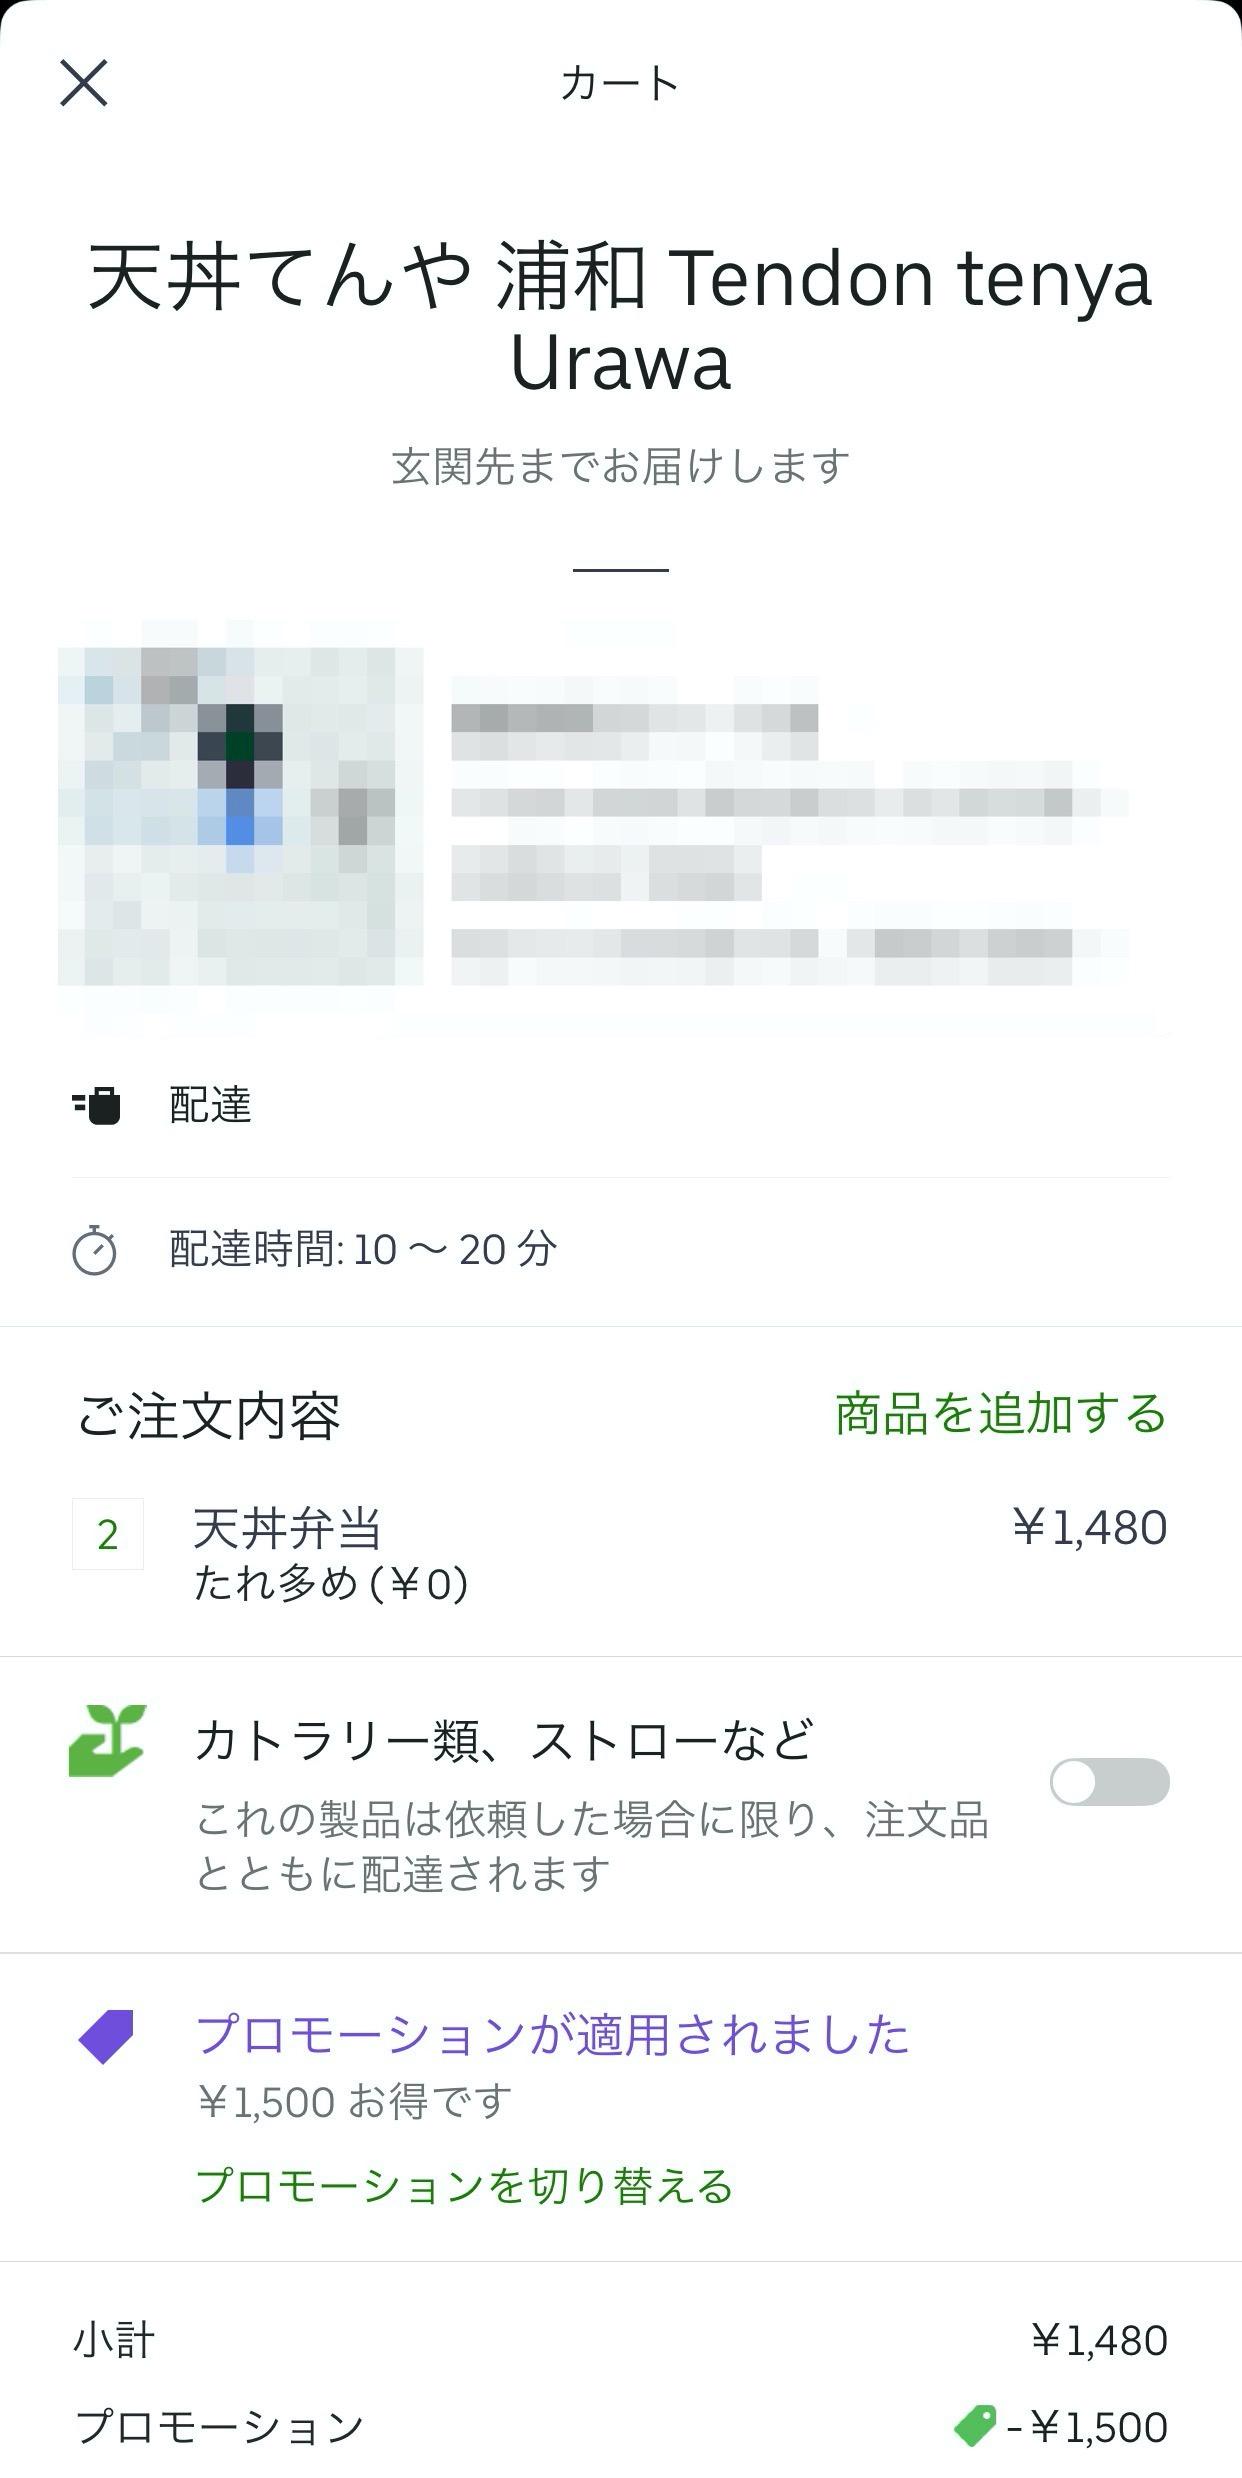 【Uber Eats】「天丼てんや」2